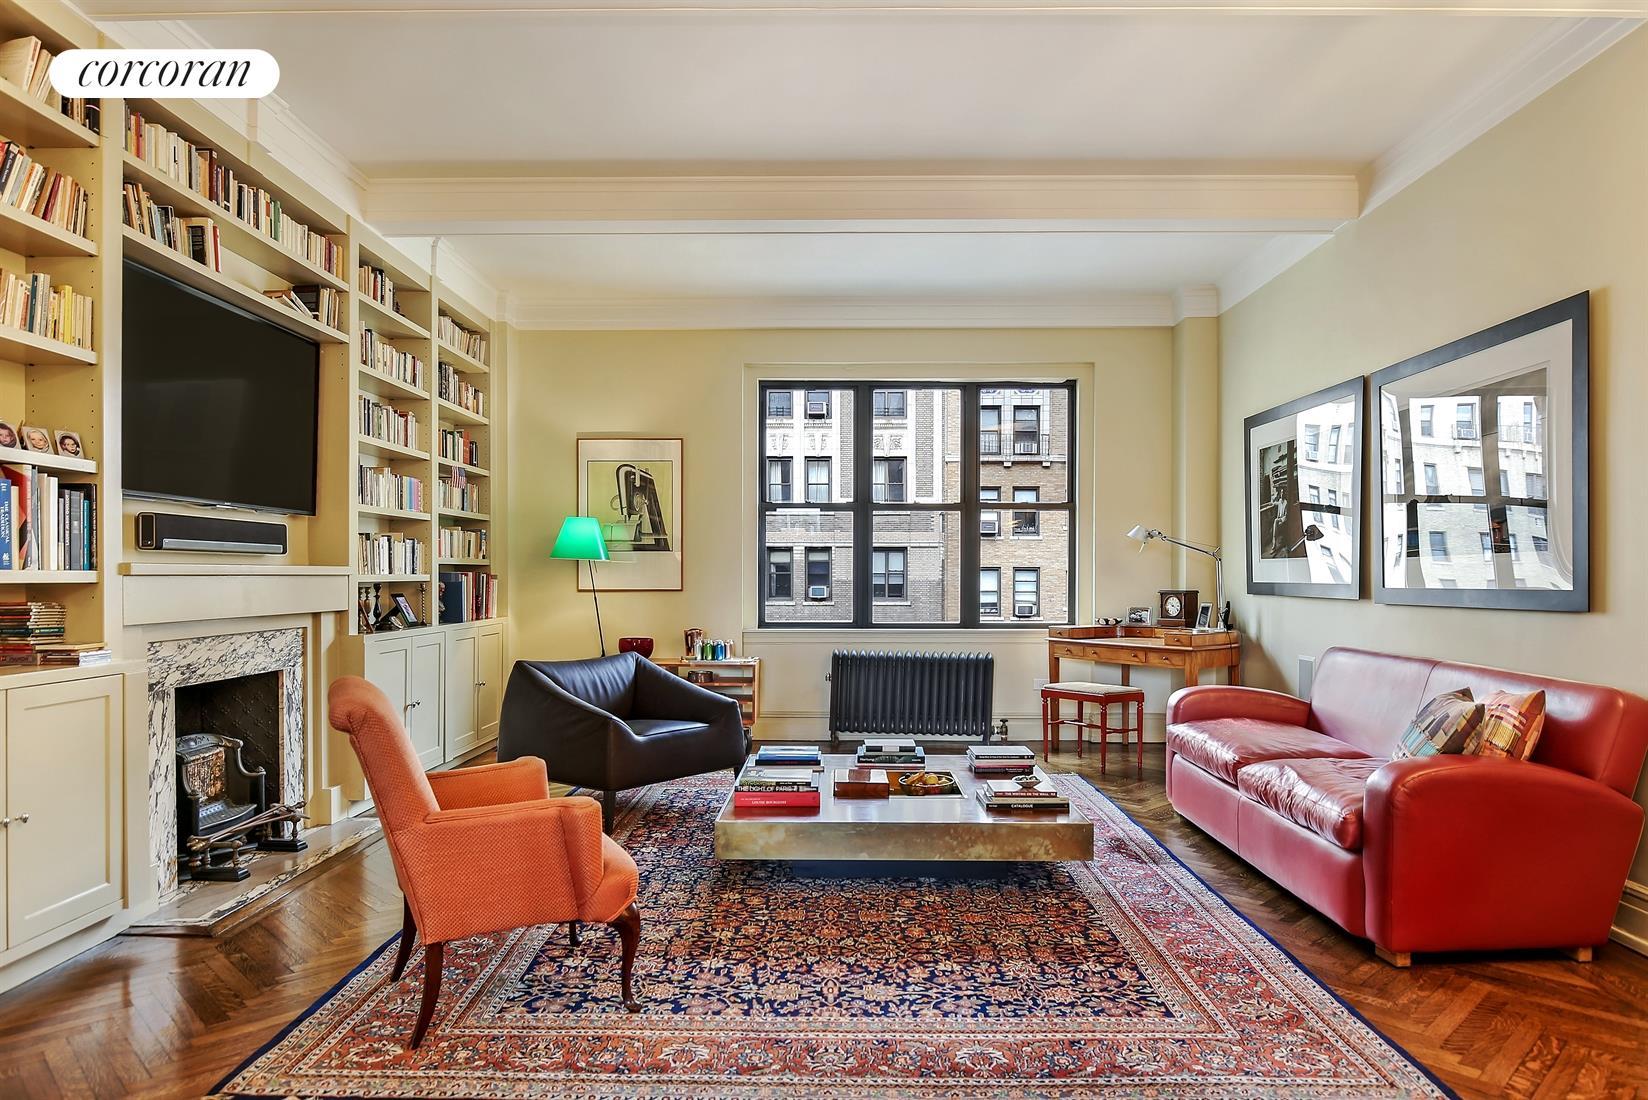 Corcoran Curtis Rhine West Side 888 Seventh Avenue Realtor Real Estate Agent Broker Referral Experience New York Manhattan Brooklyn